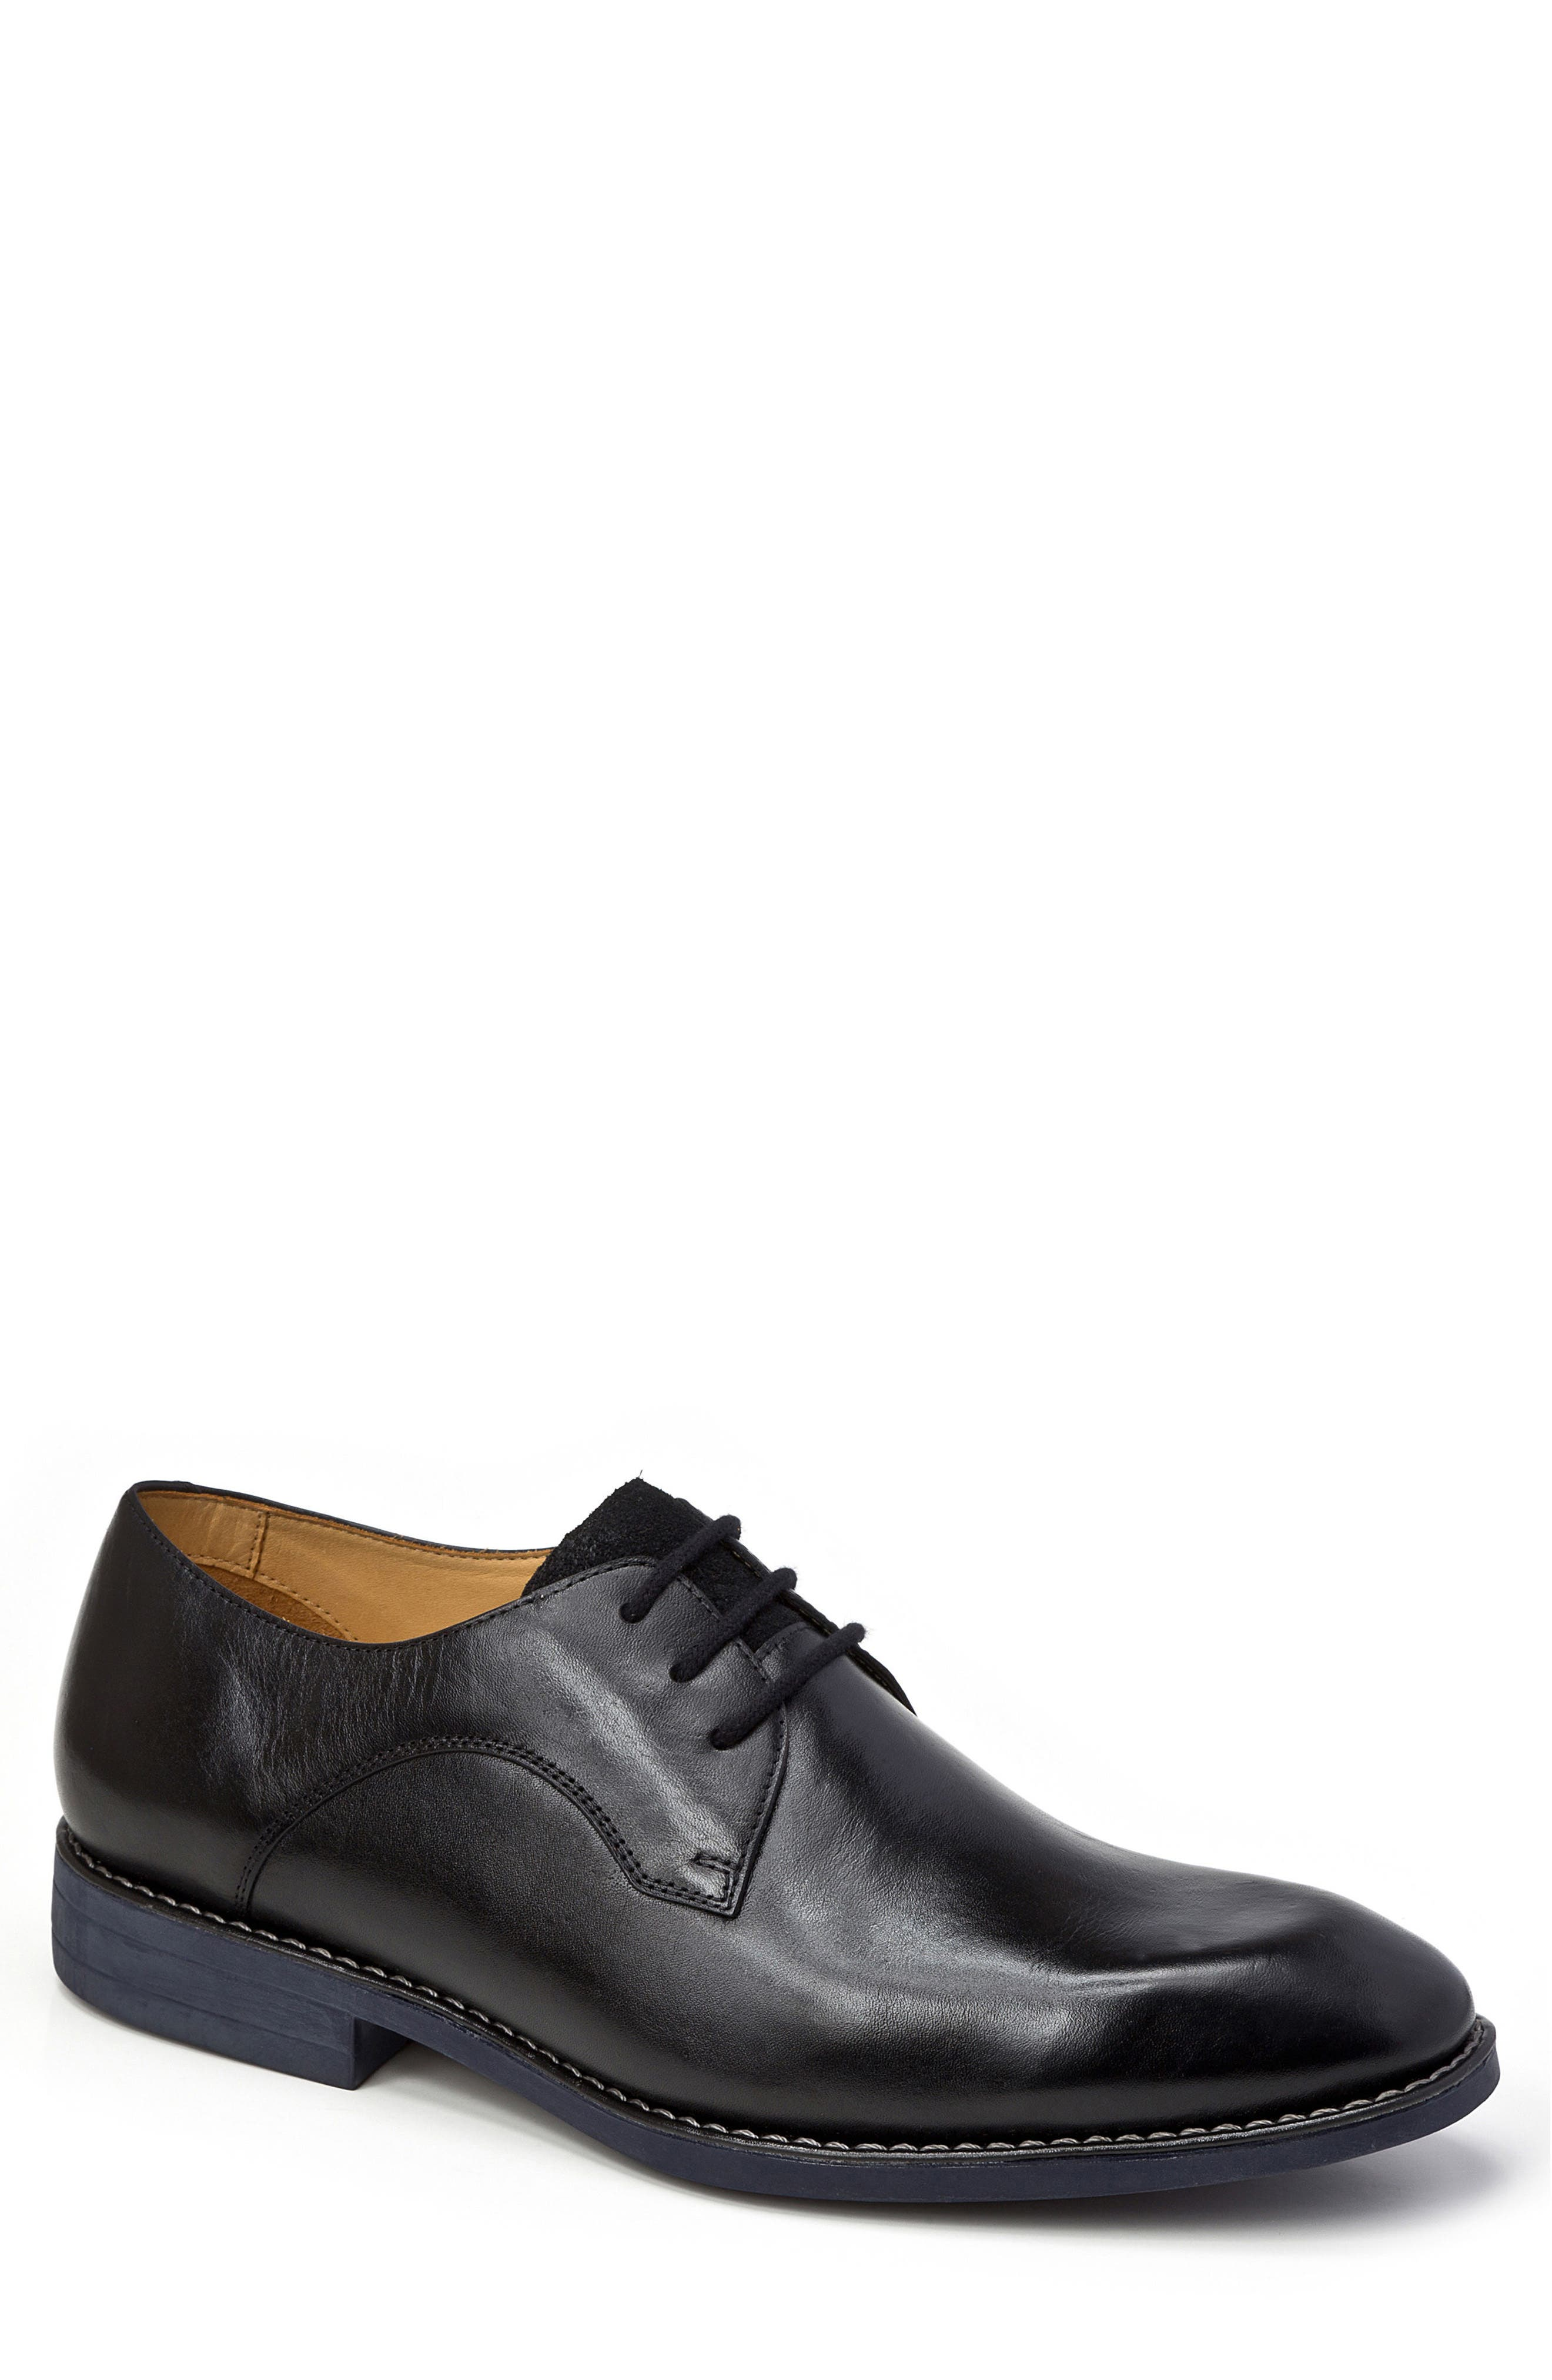 Garret Plain Toe Derby,                         Main,                         color, BLACK LEATHER